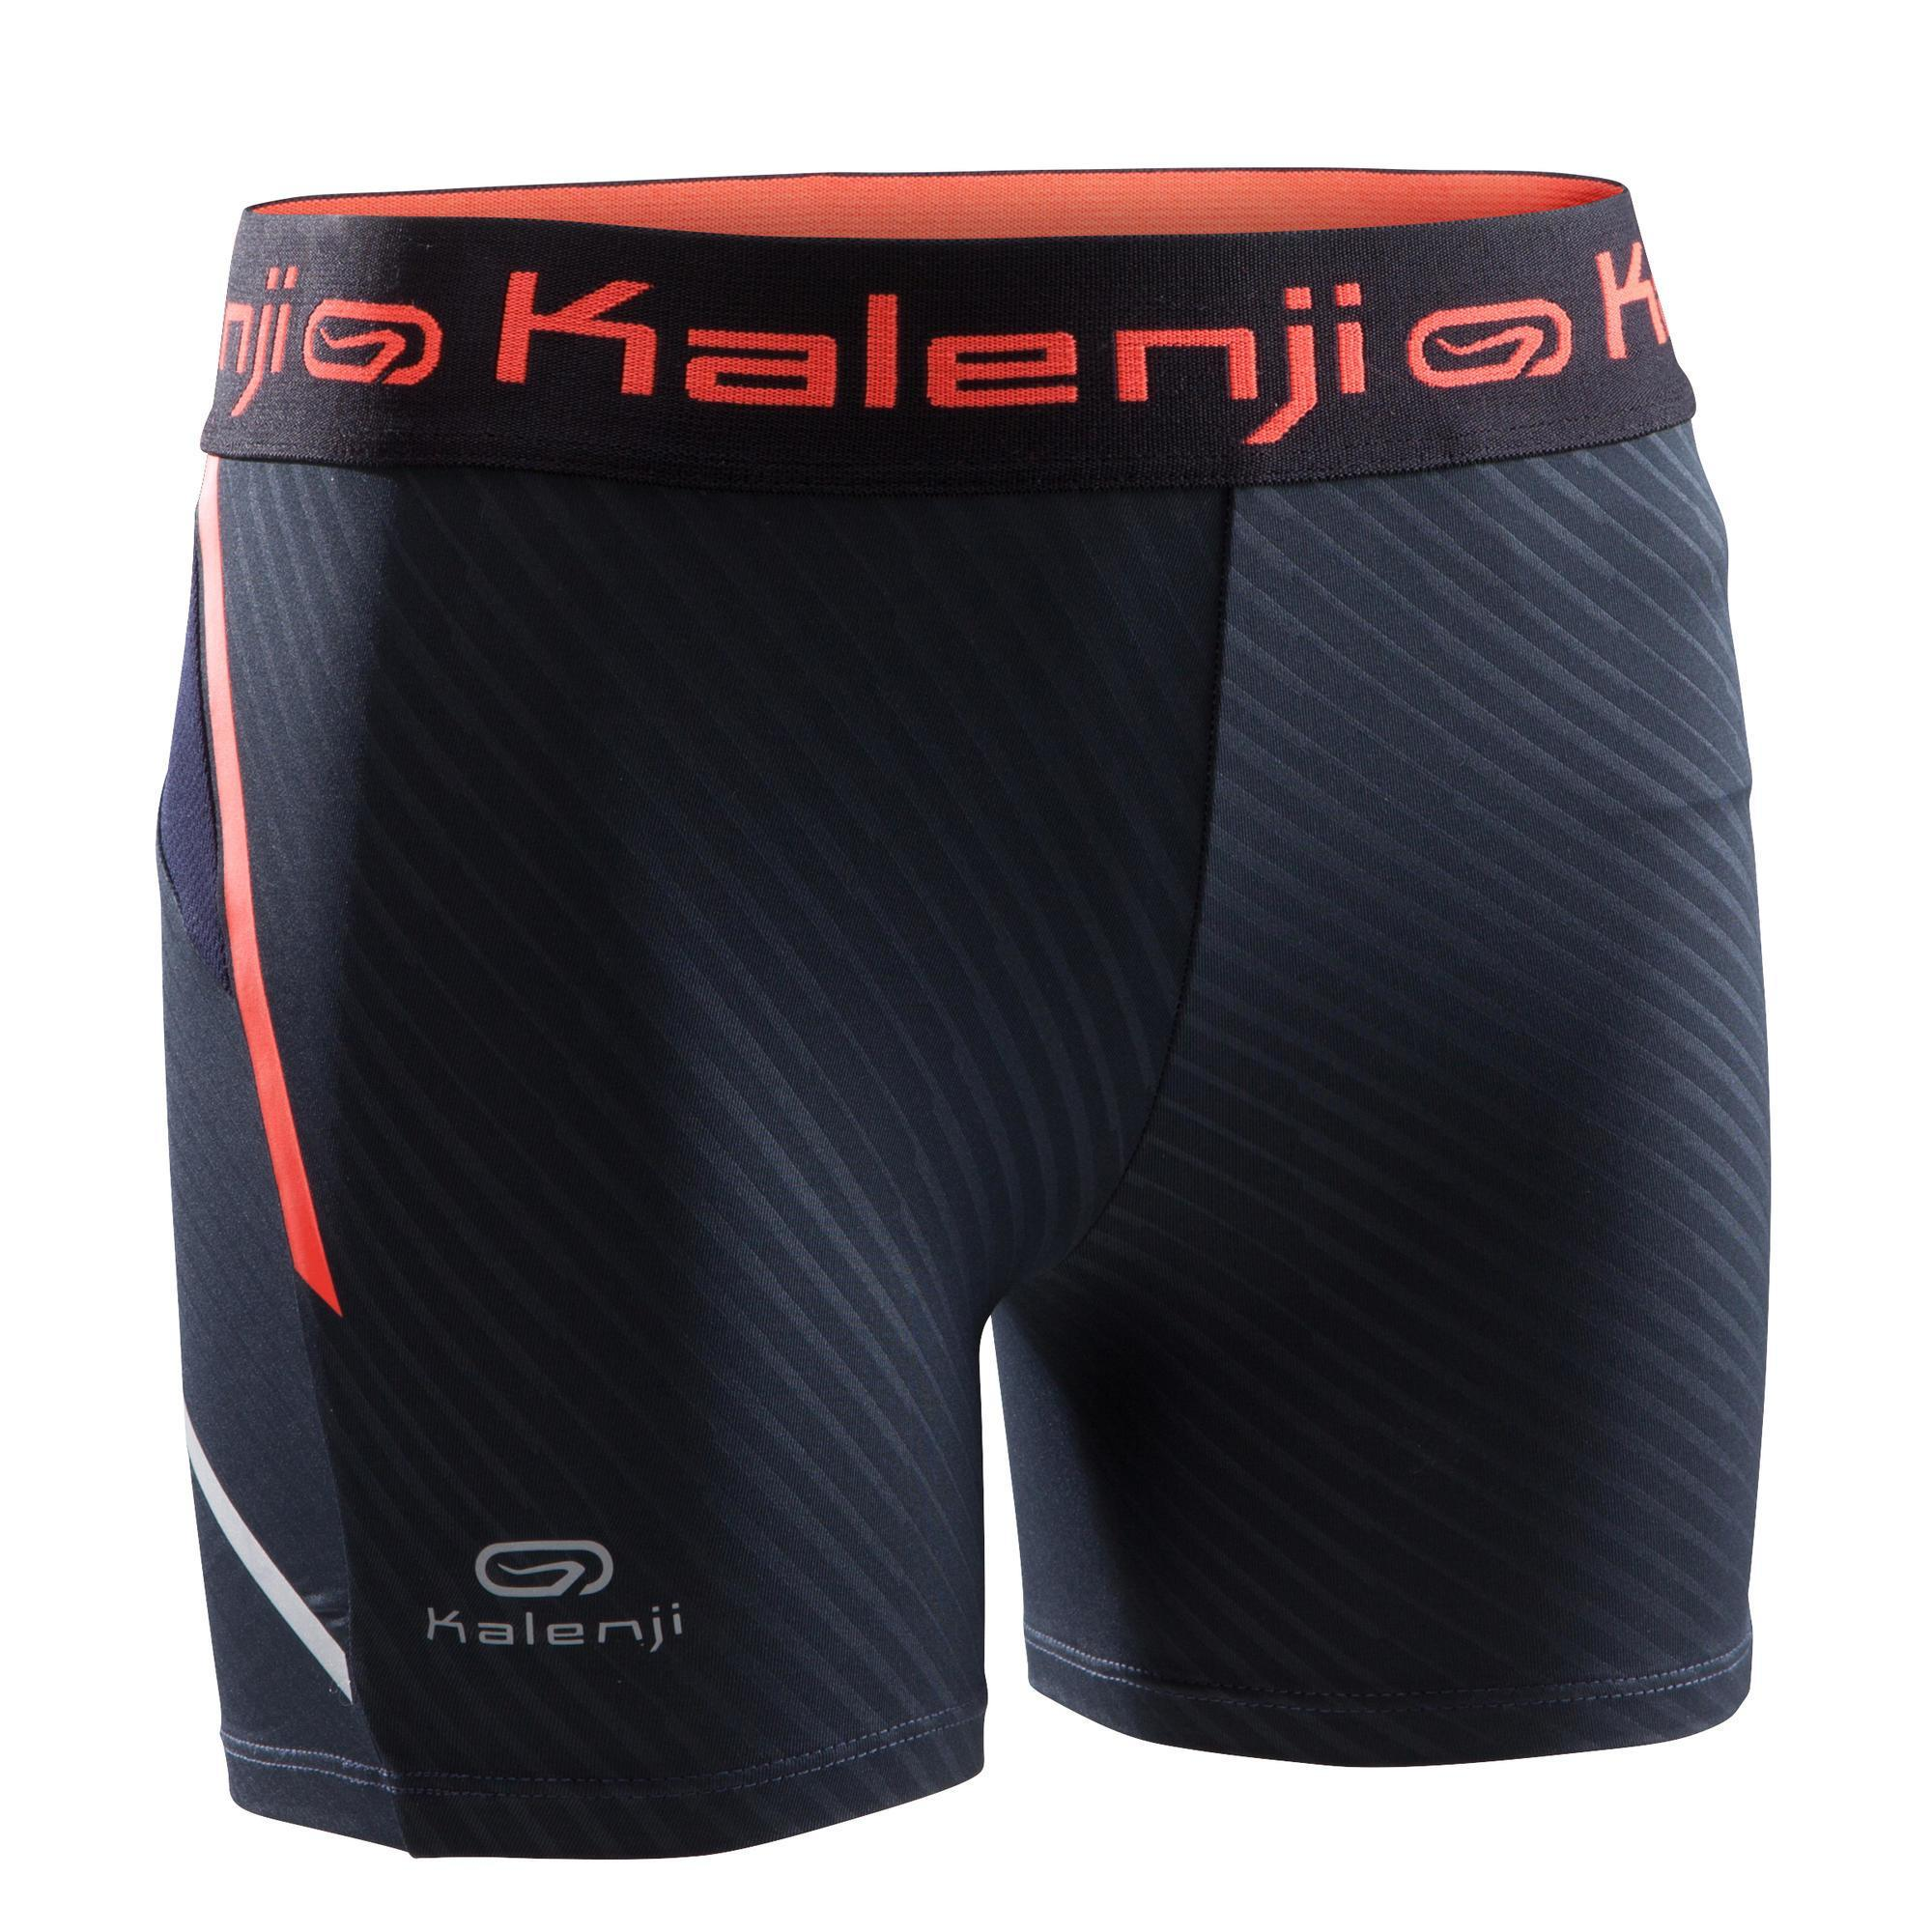 Kalenji Atletiek shorty voor meisjes zwart fluo-oranje